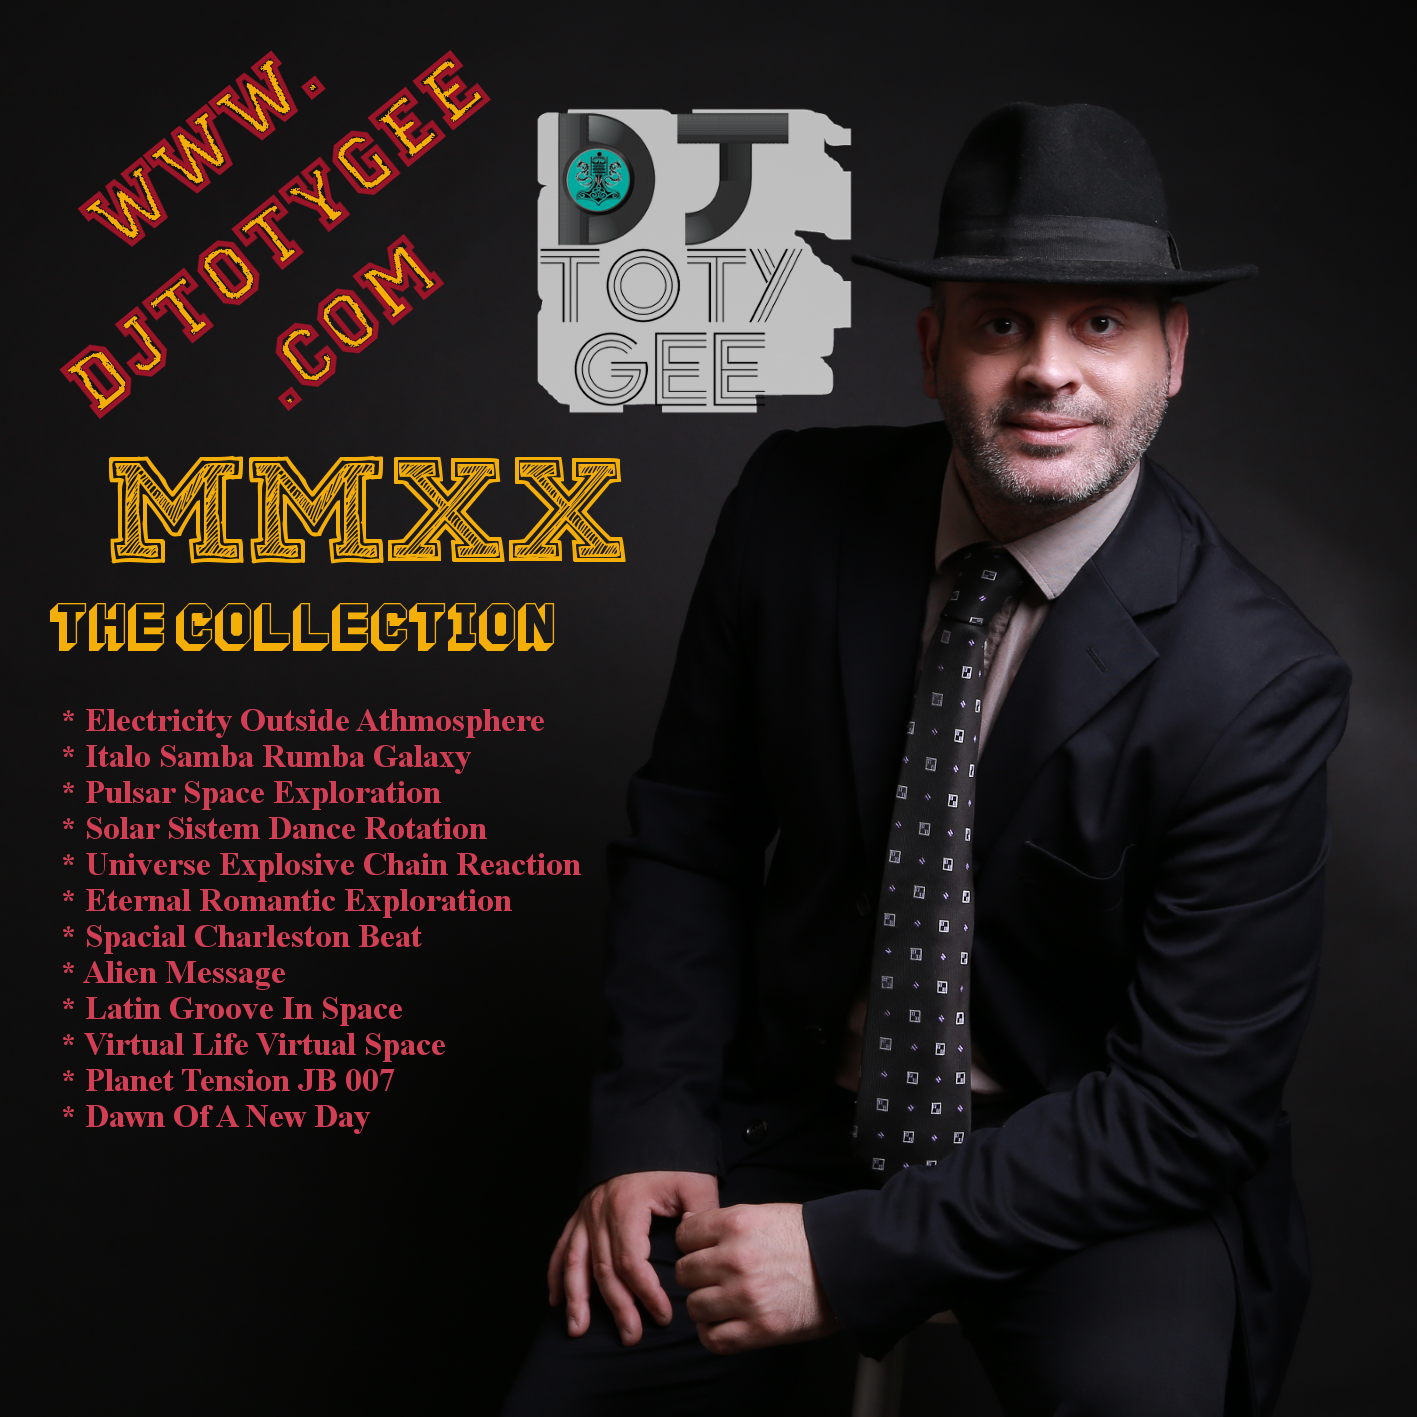 MMXX THE COLLECTION (Album)